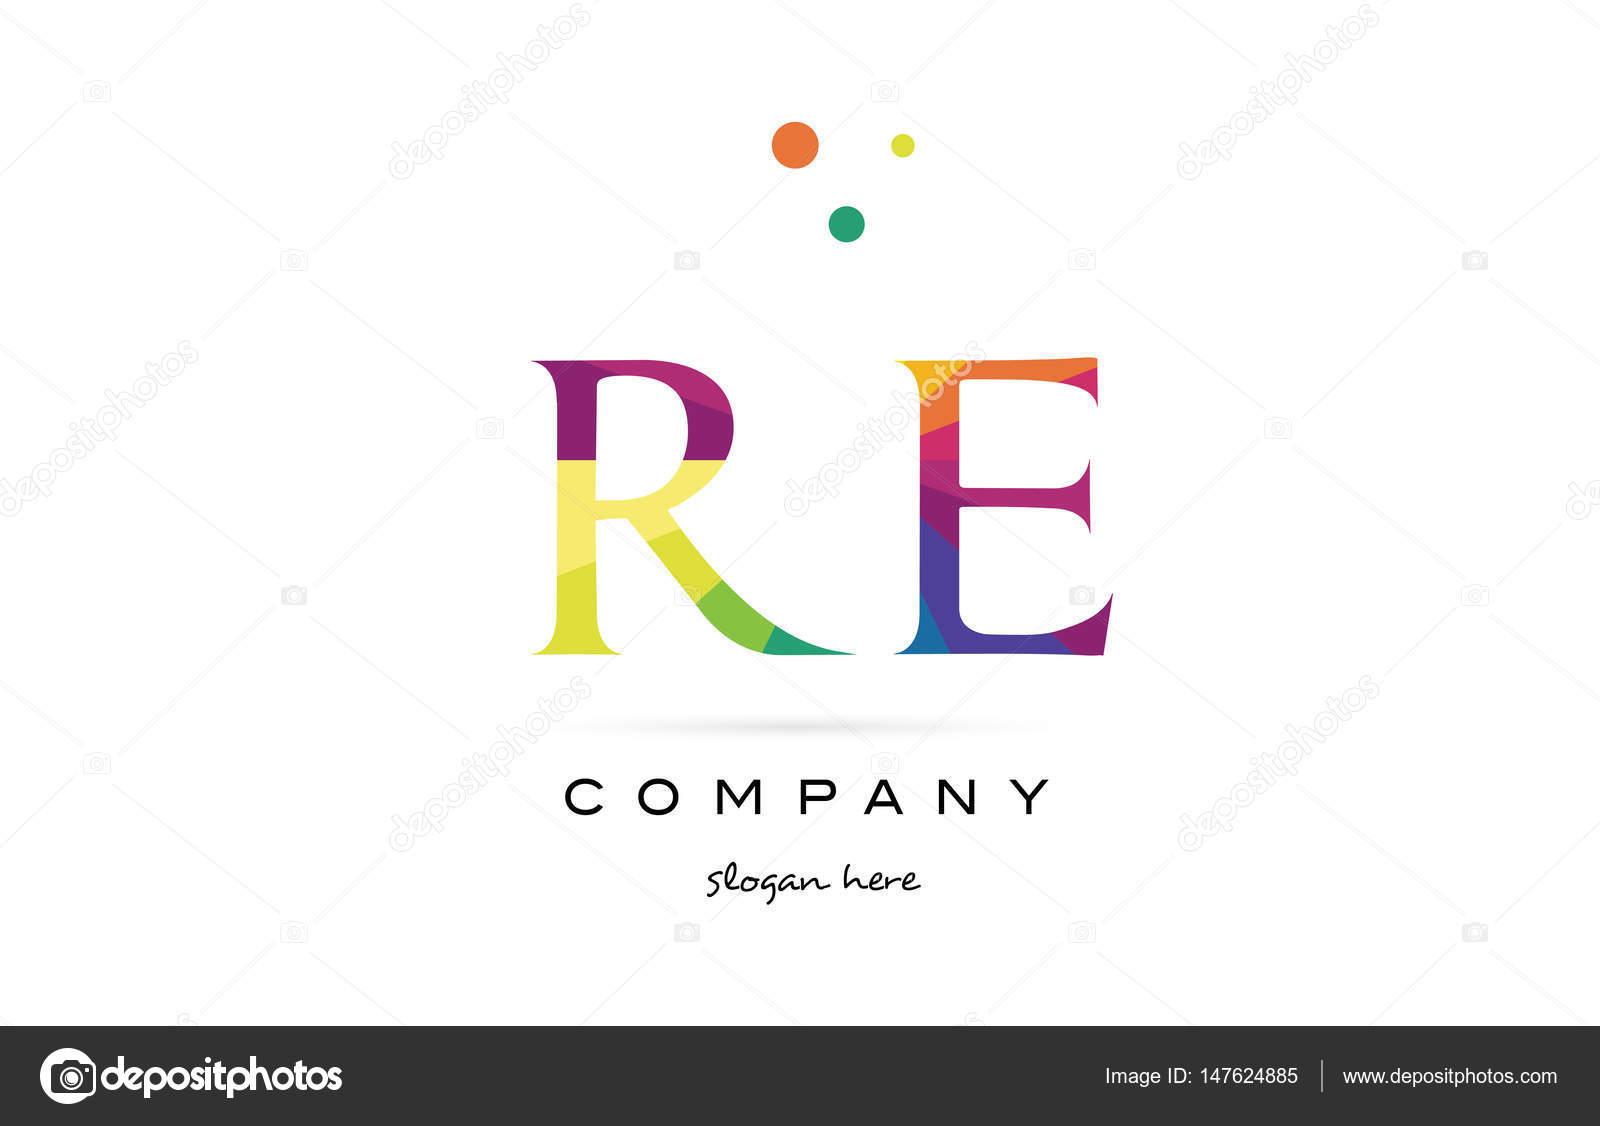 Re r e kreative Regenbogen Farben Alphabet Buchstaben Logo Symbol ...